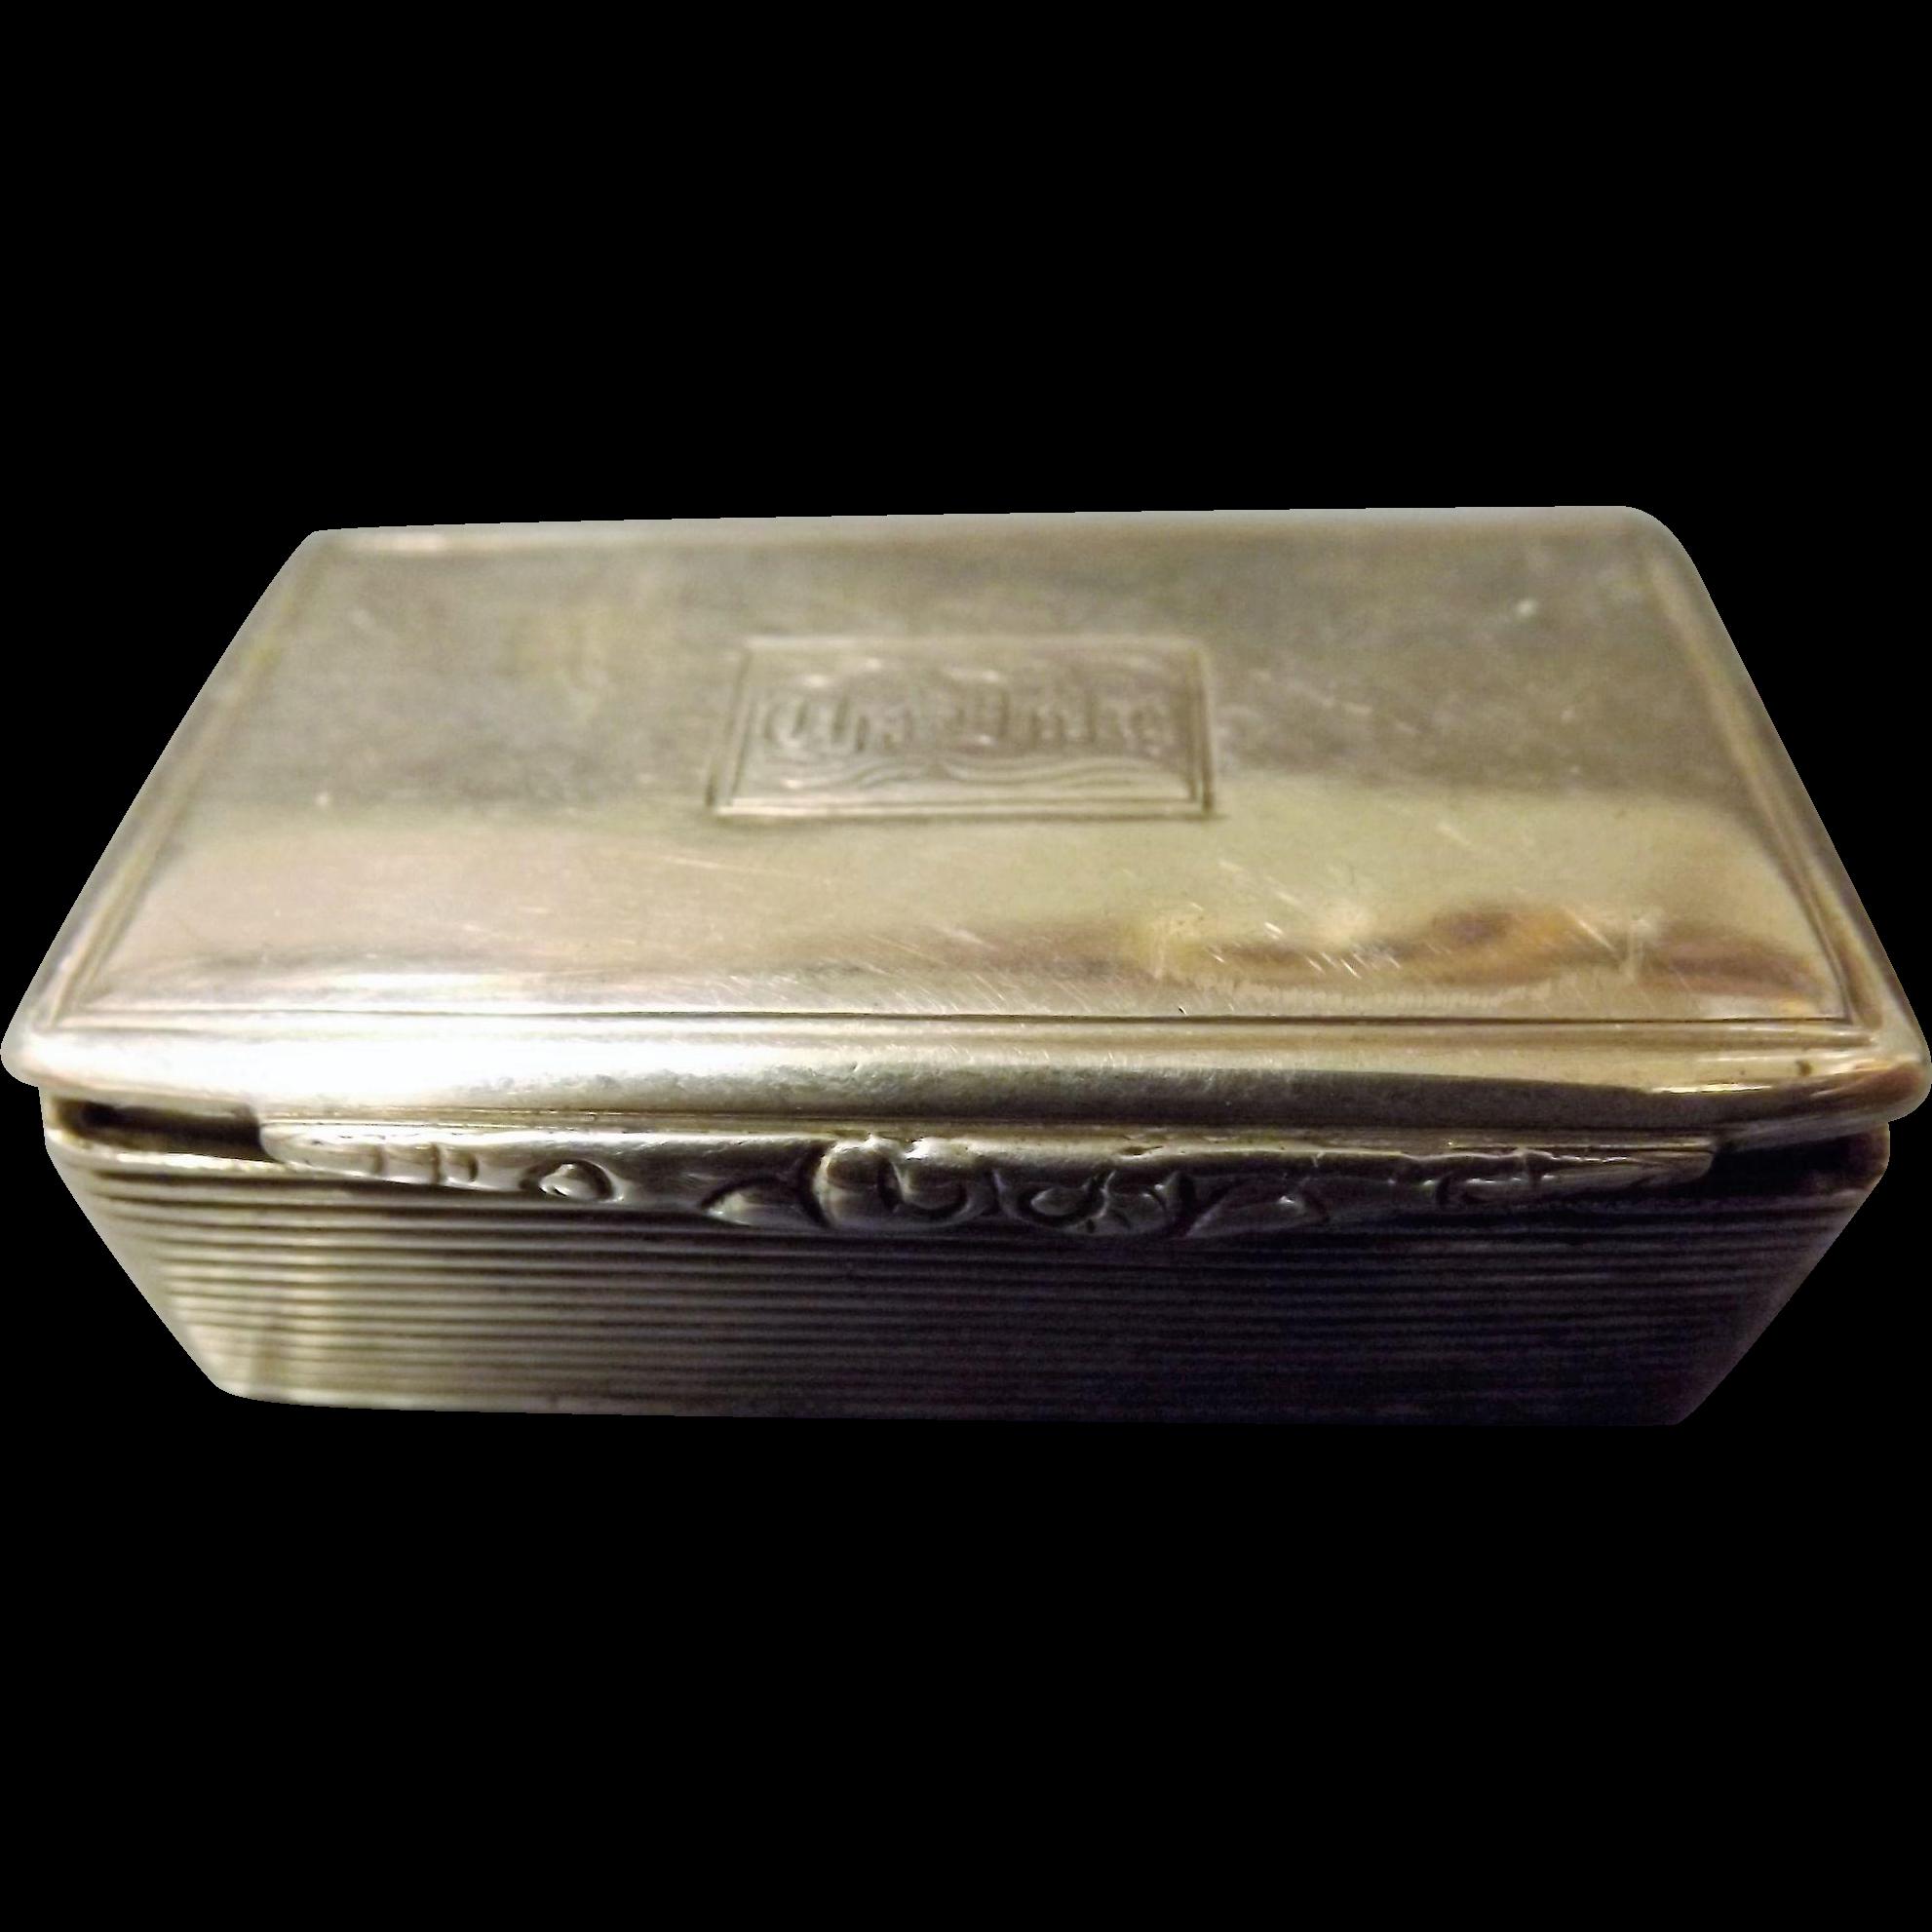 Early Victorian Sterling Silver Snuff Box - Birmingham 1840